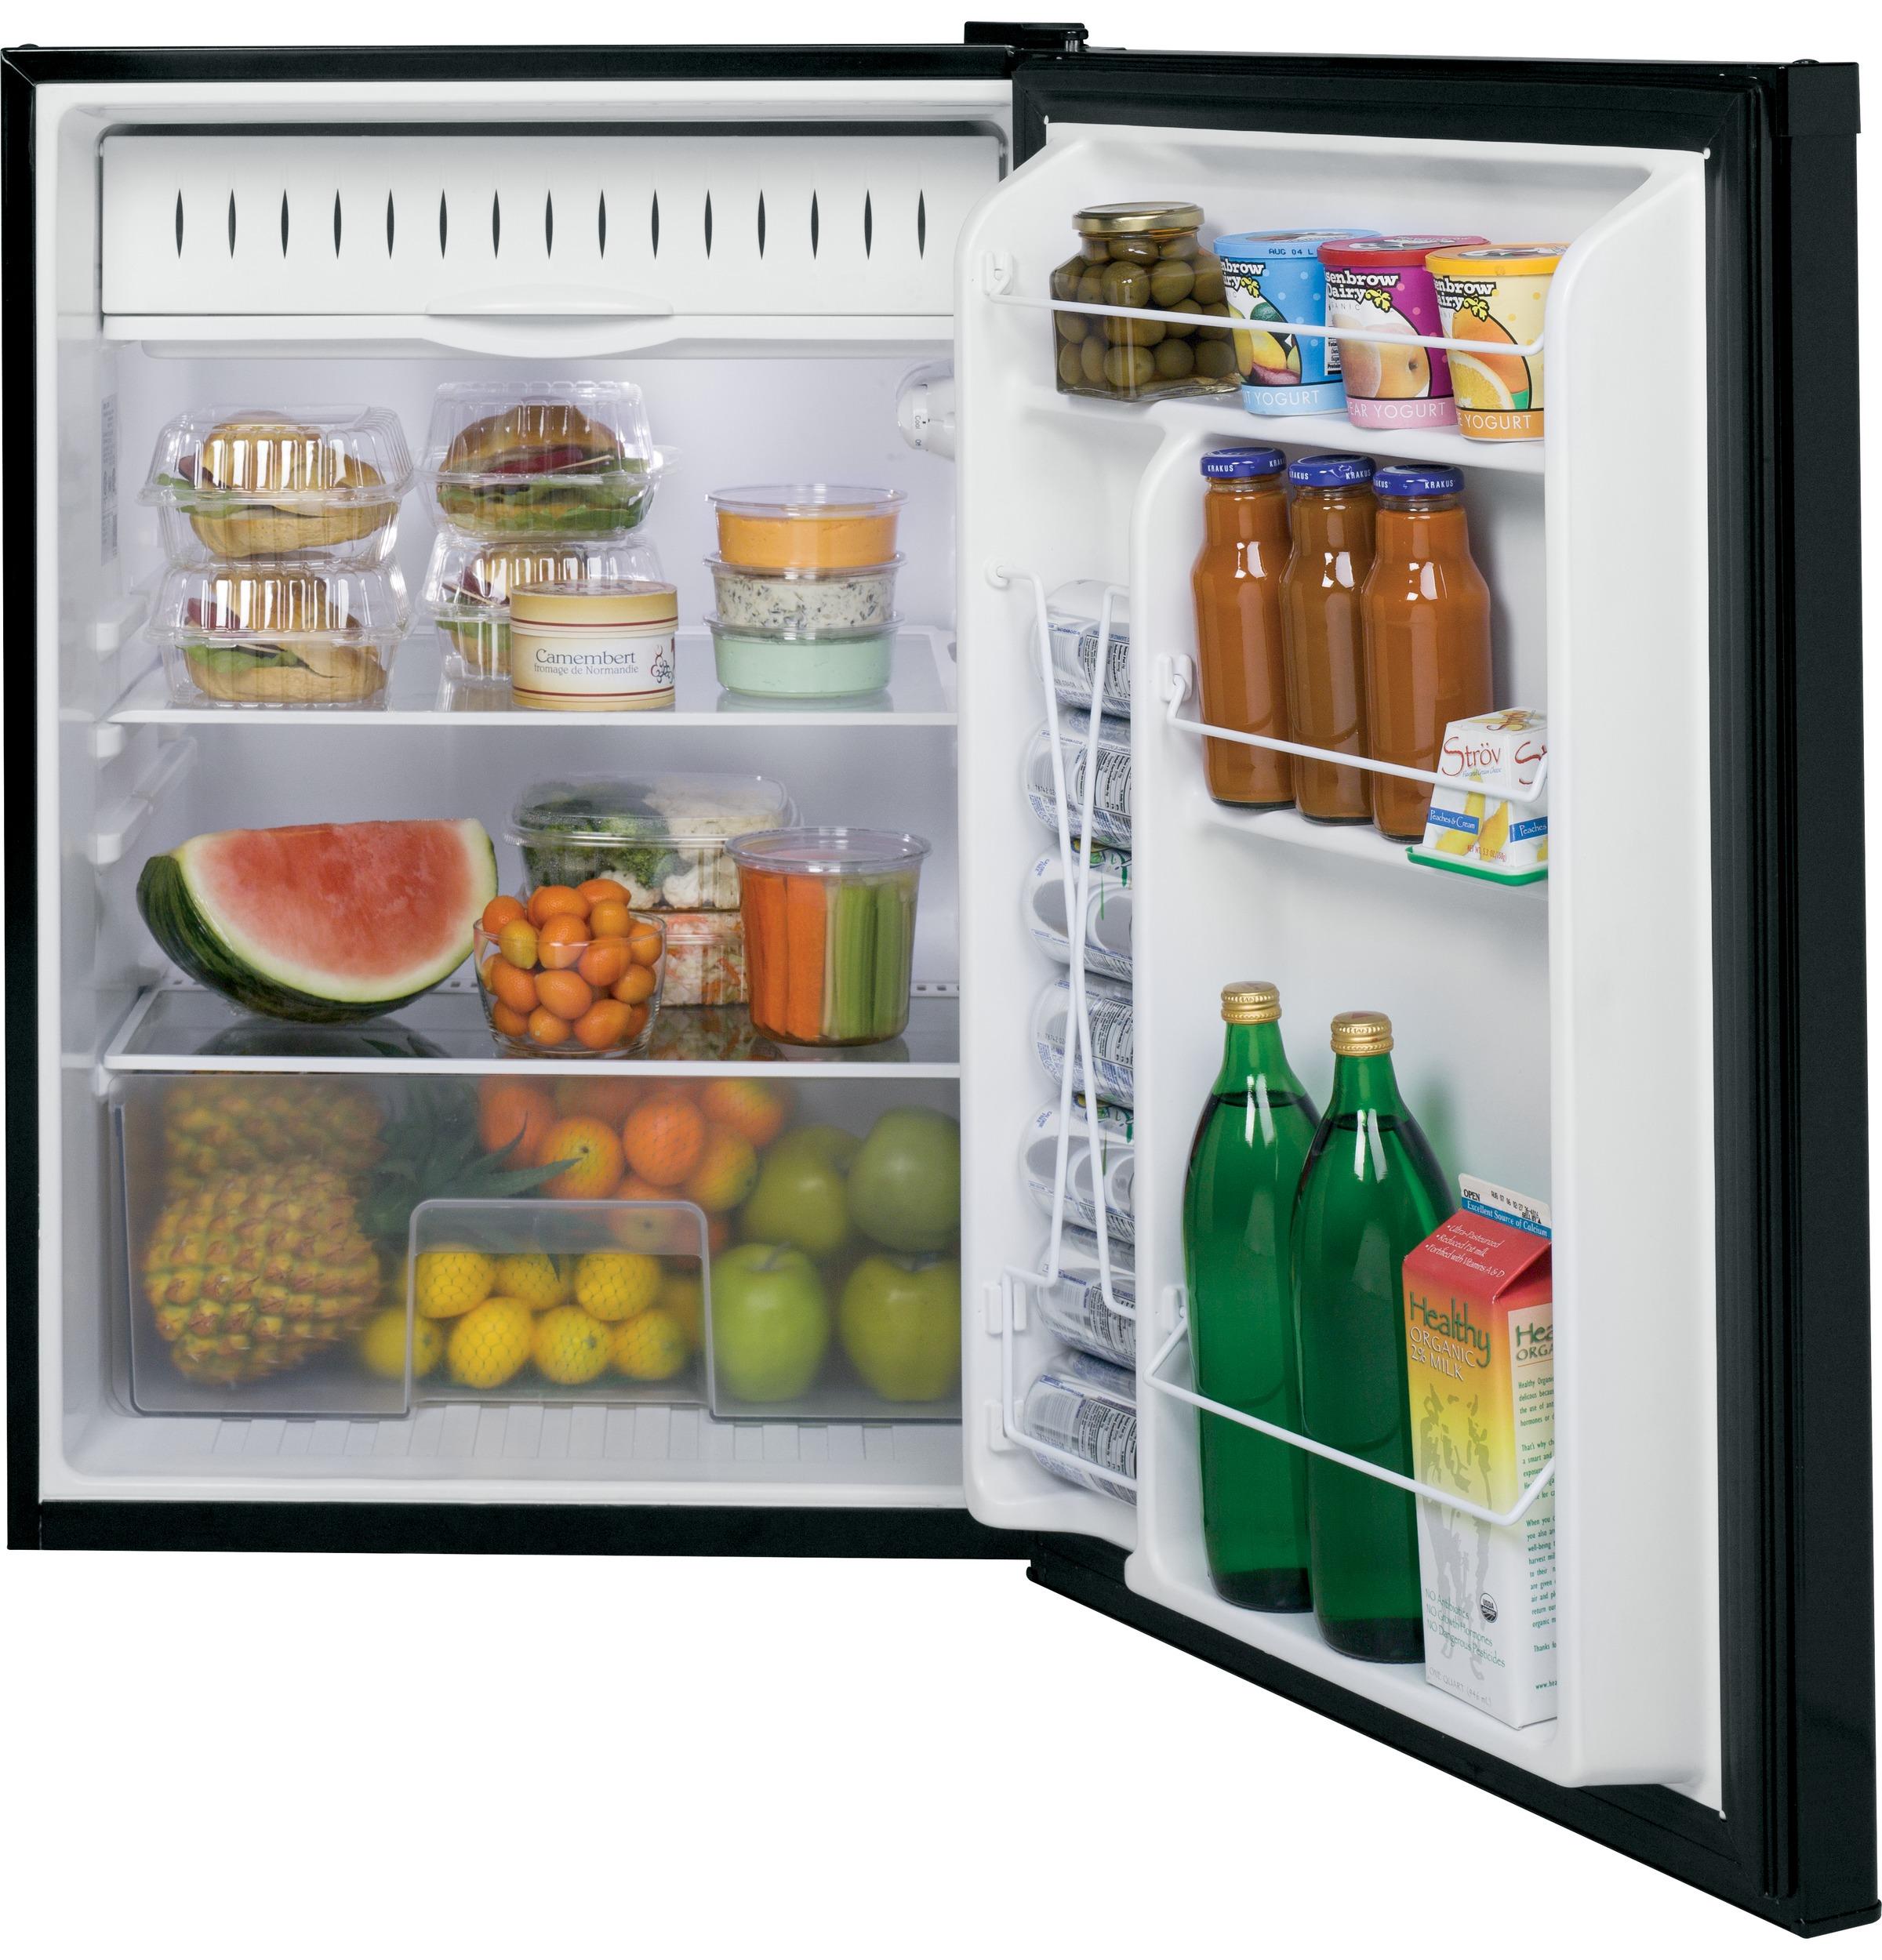 Model: GCE06GGHBB | GE GE® Compact Refrigerator